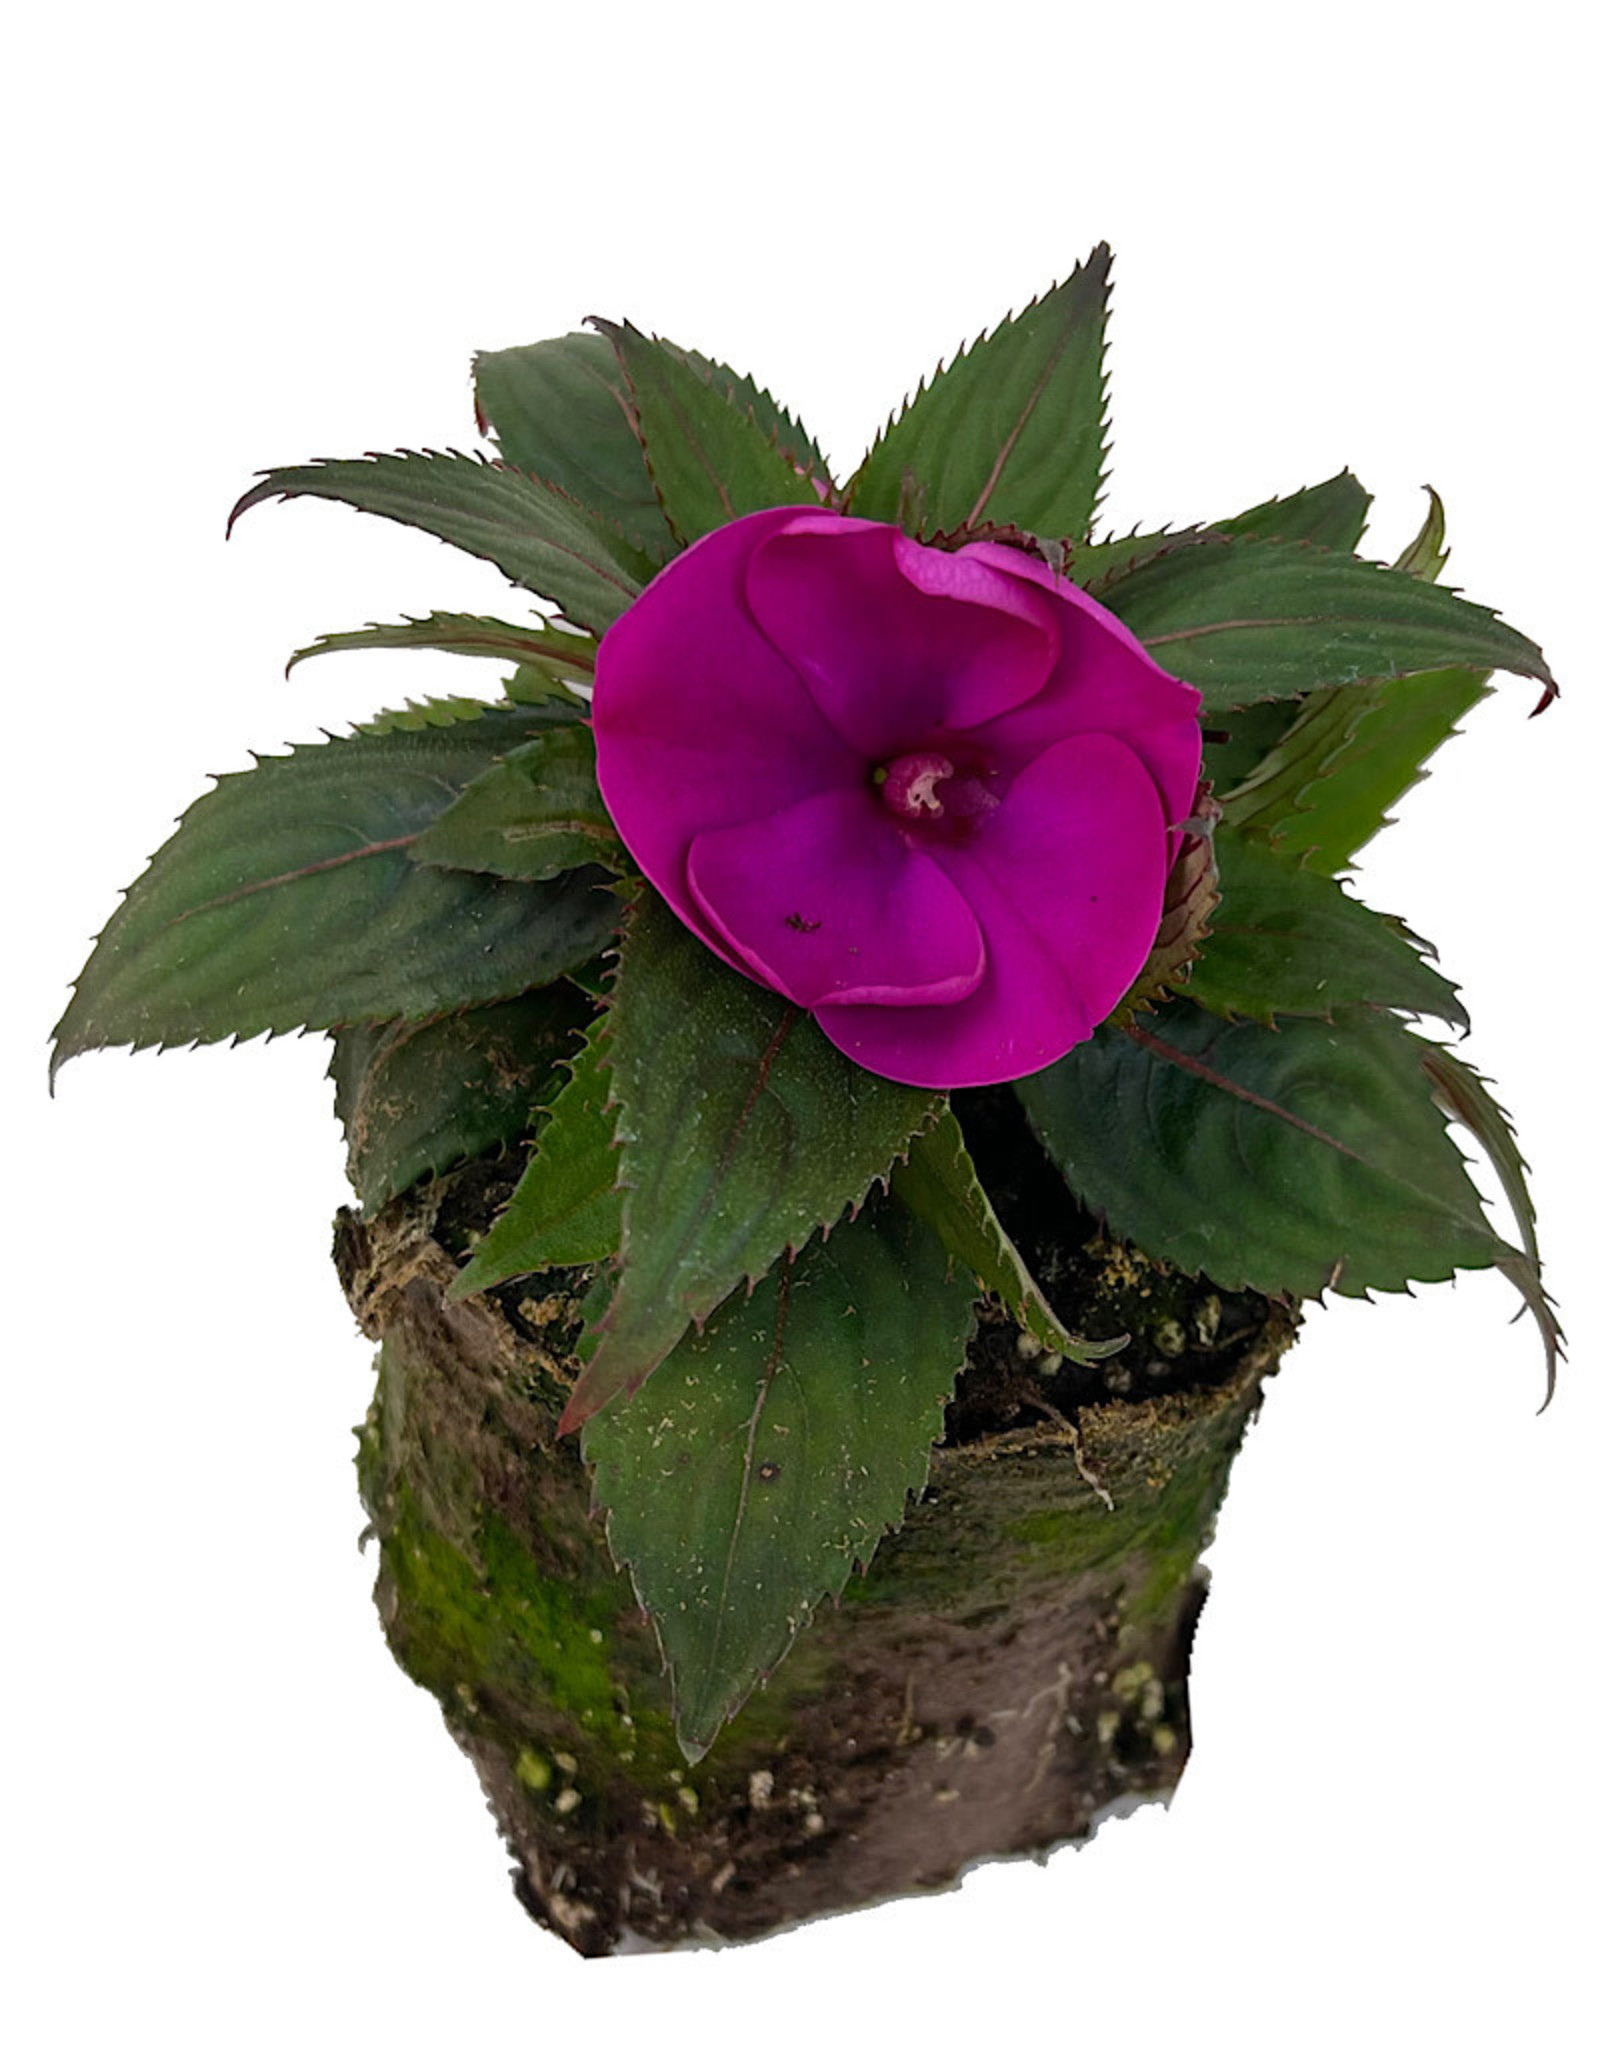 Sunpatiens 'Compact Purple' 4 Inch